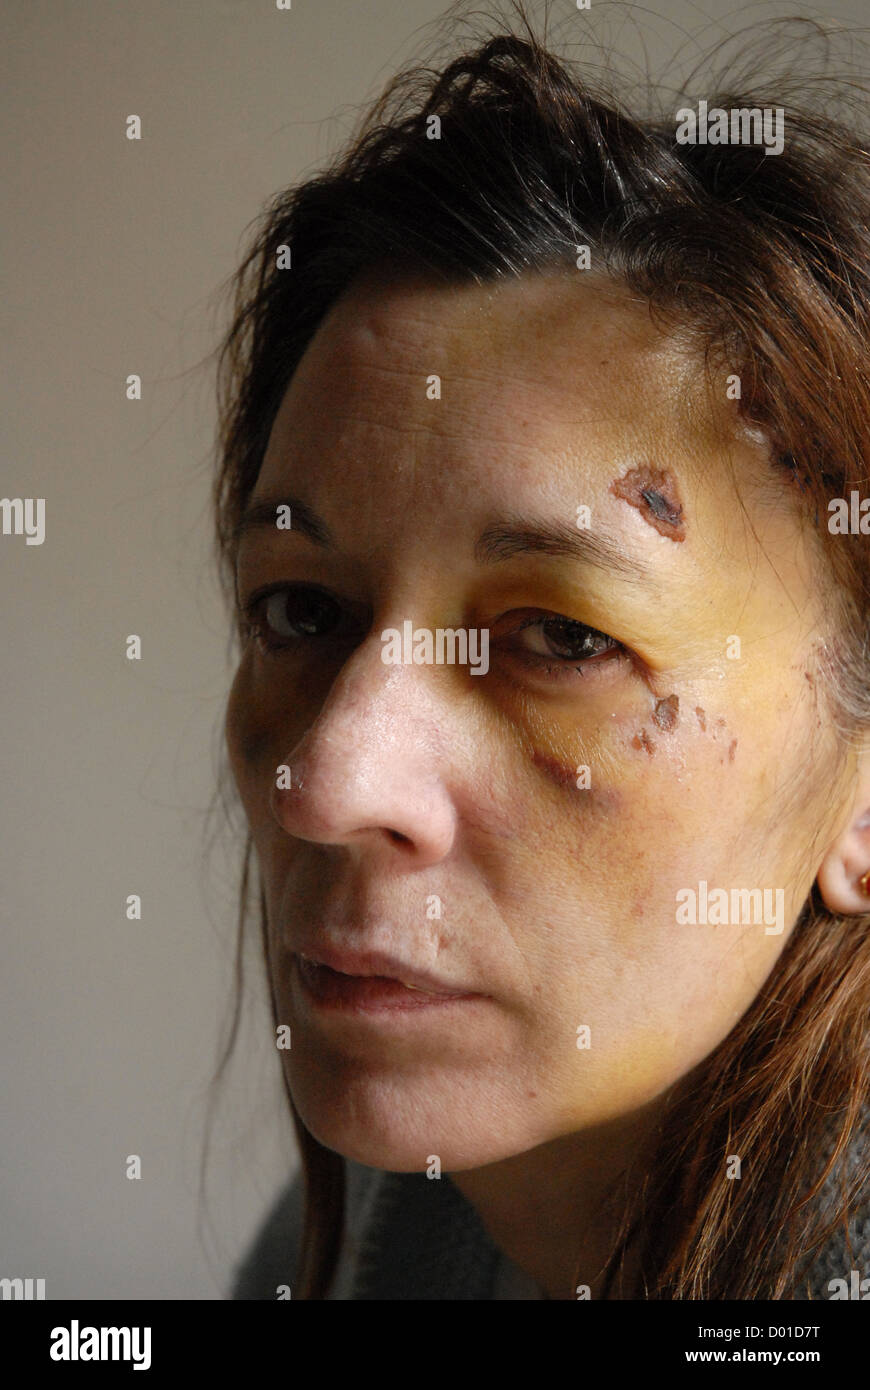 women victim of abuse - Stock Image